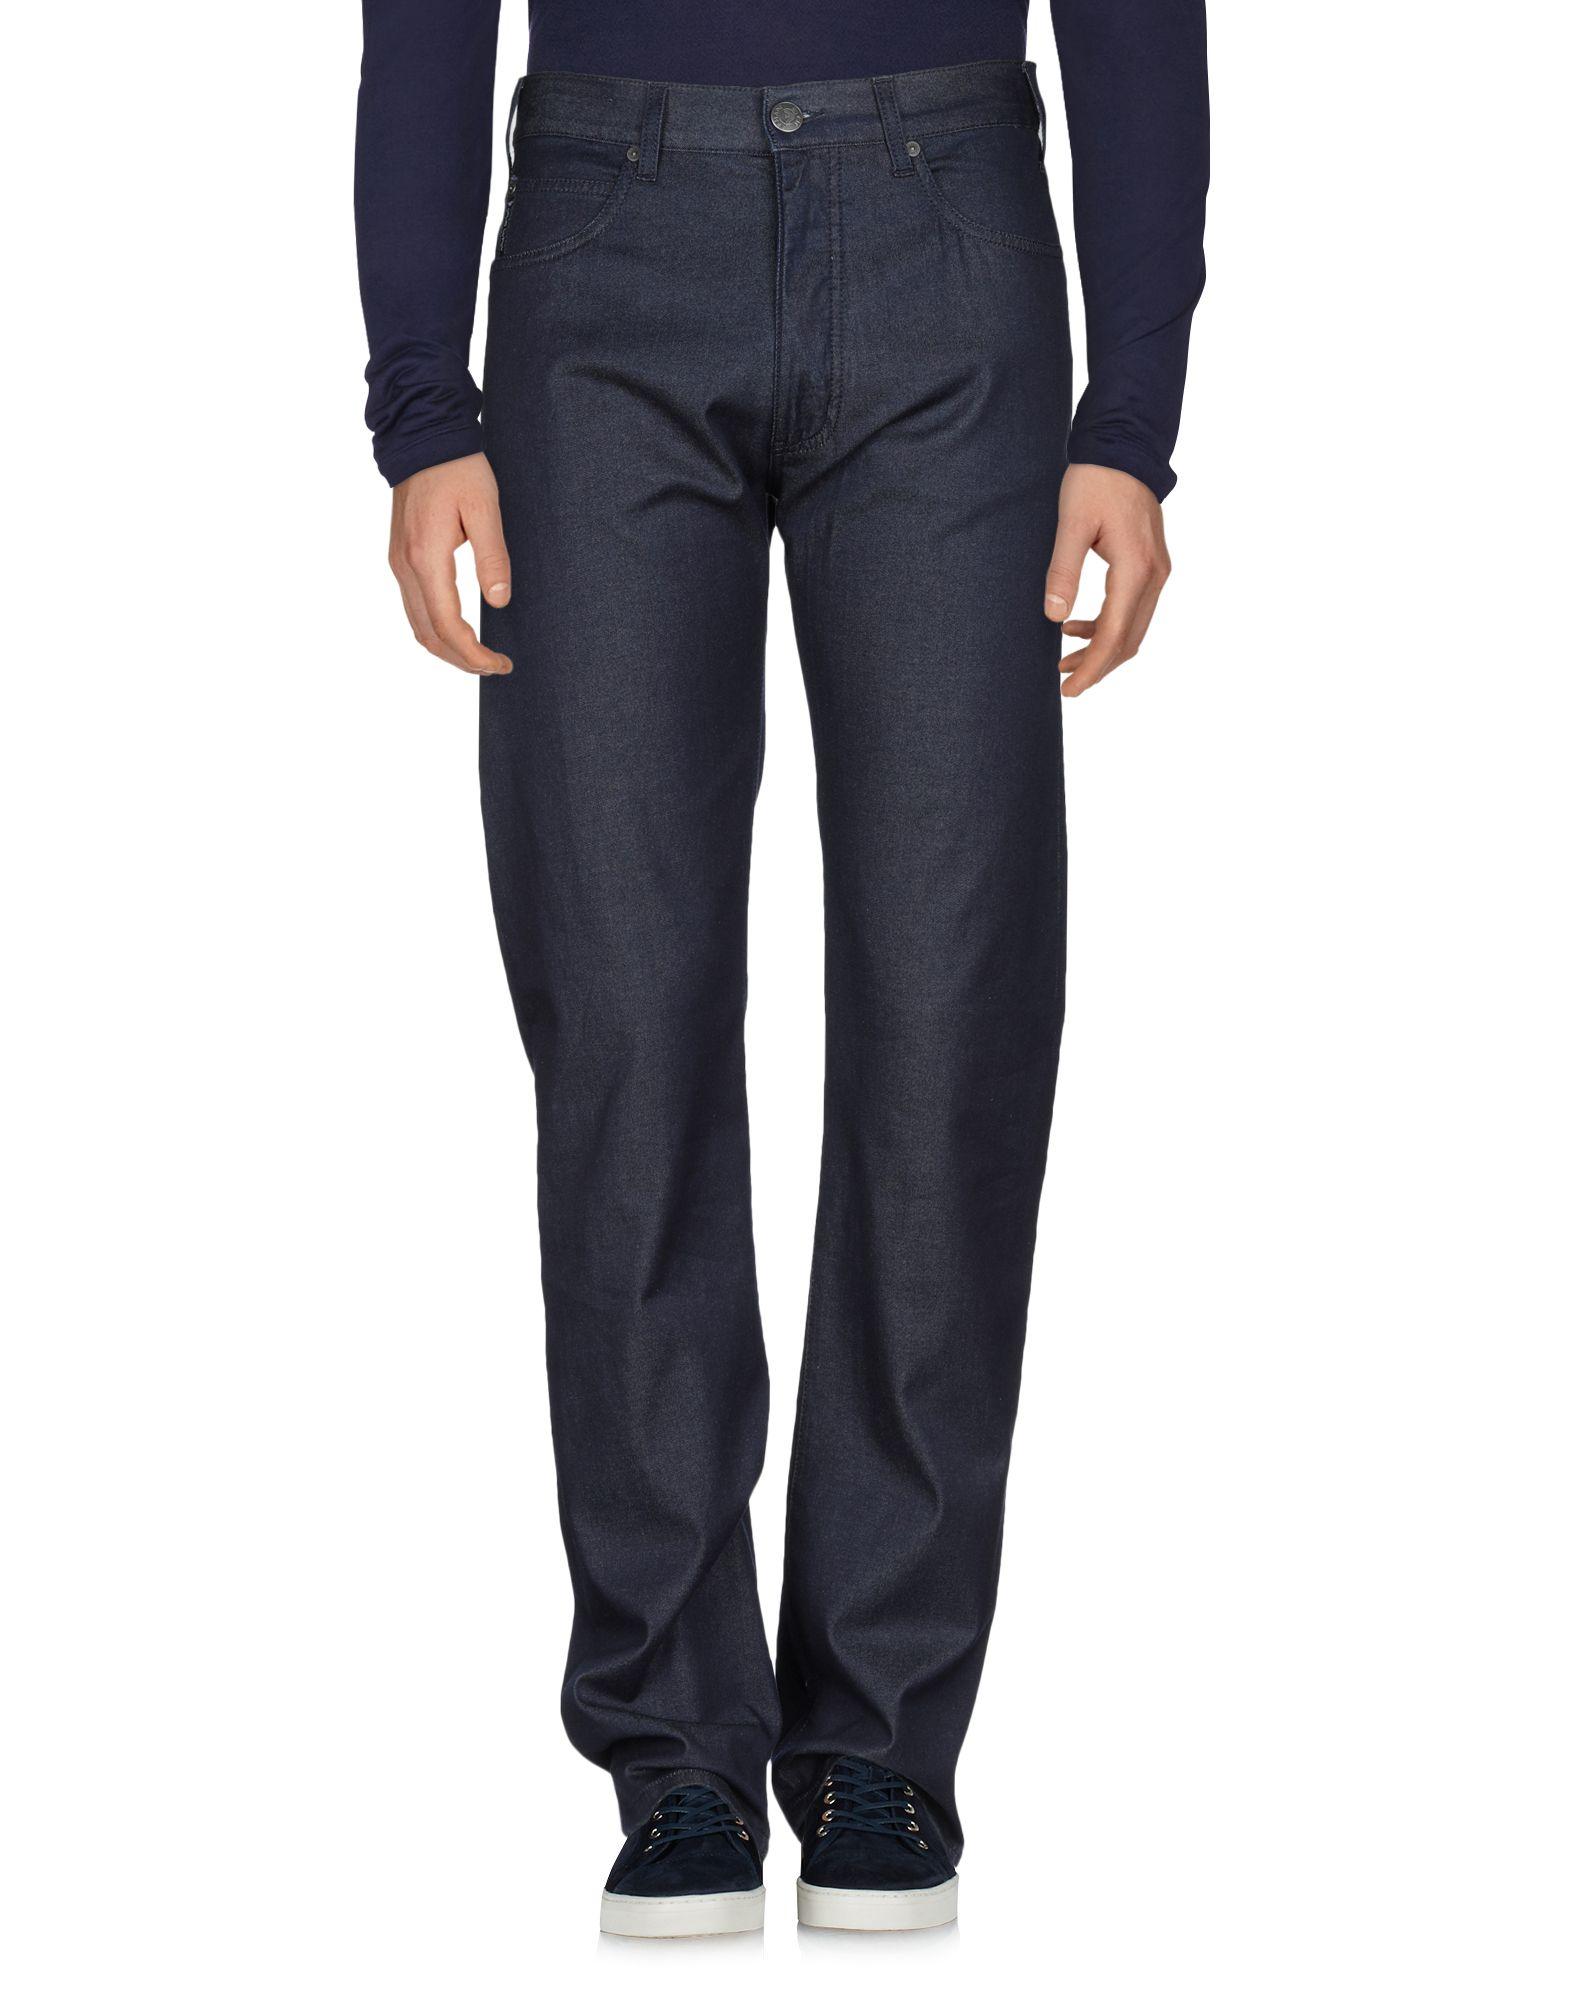 Pantaloni Jeans Armani Jeans Uomo Uomo Jeans - 42686376JE a86635